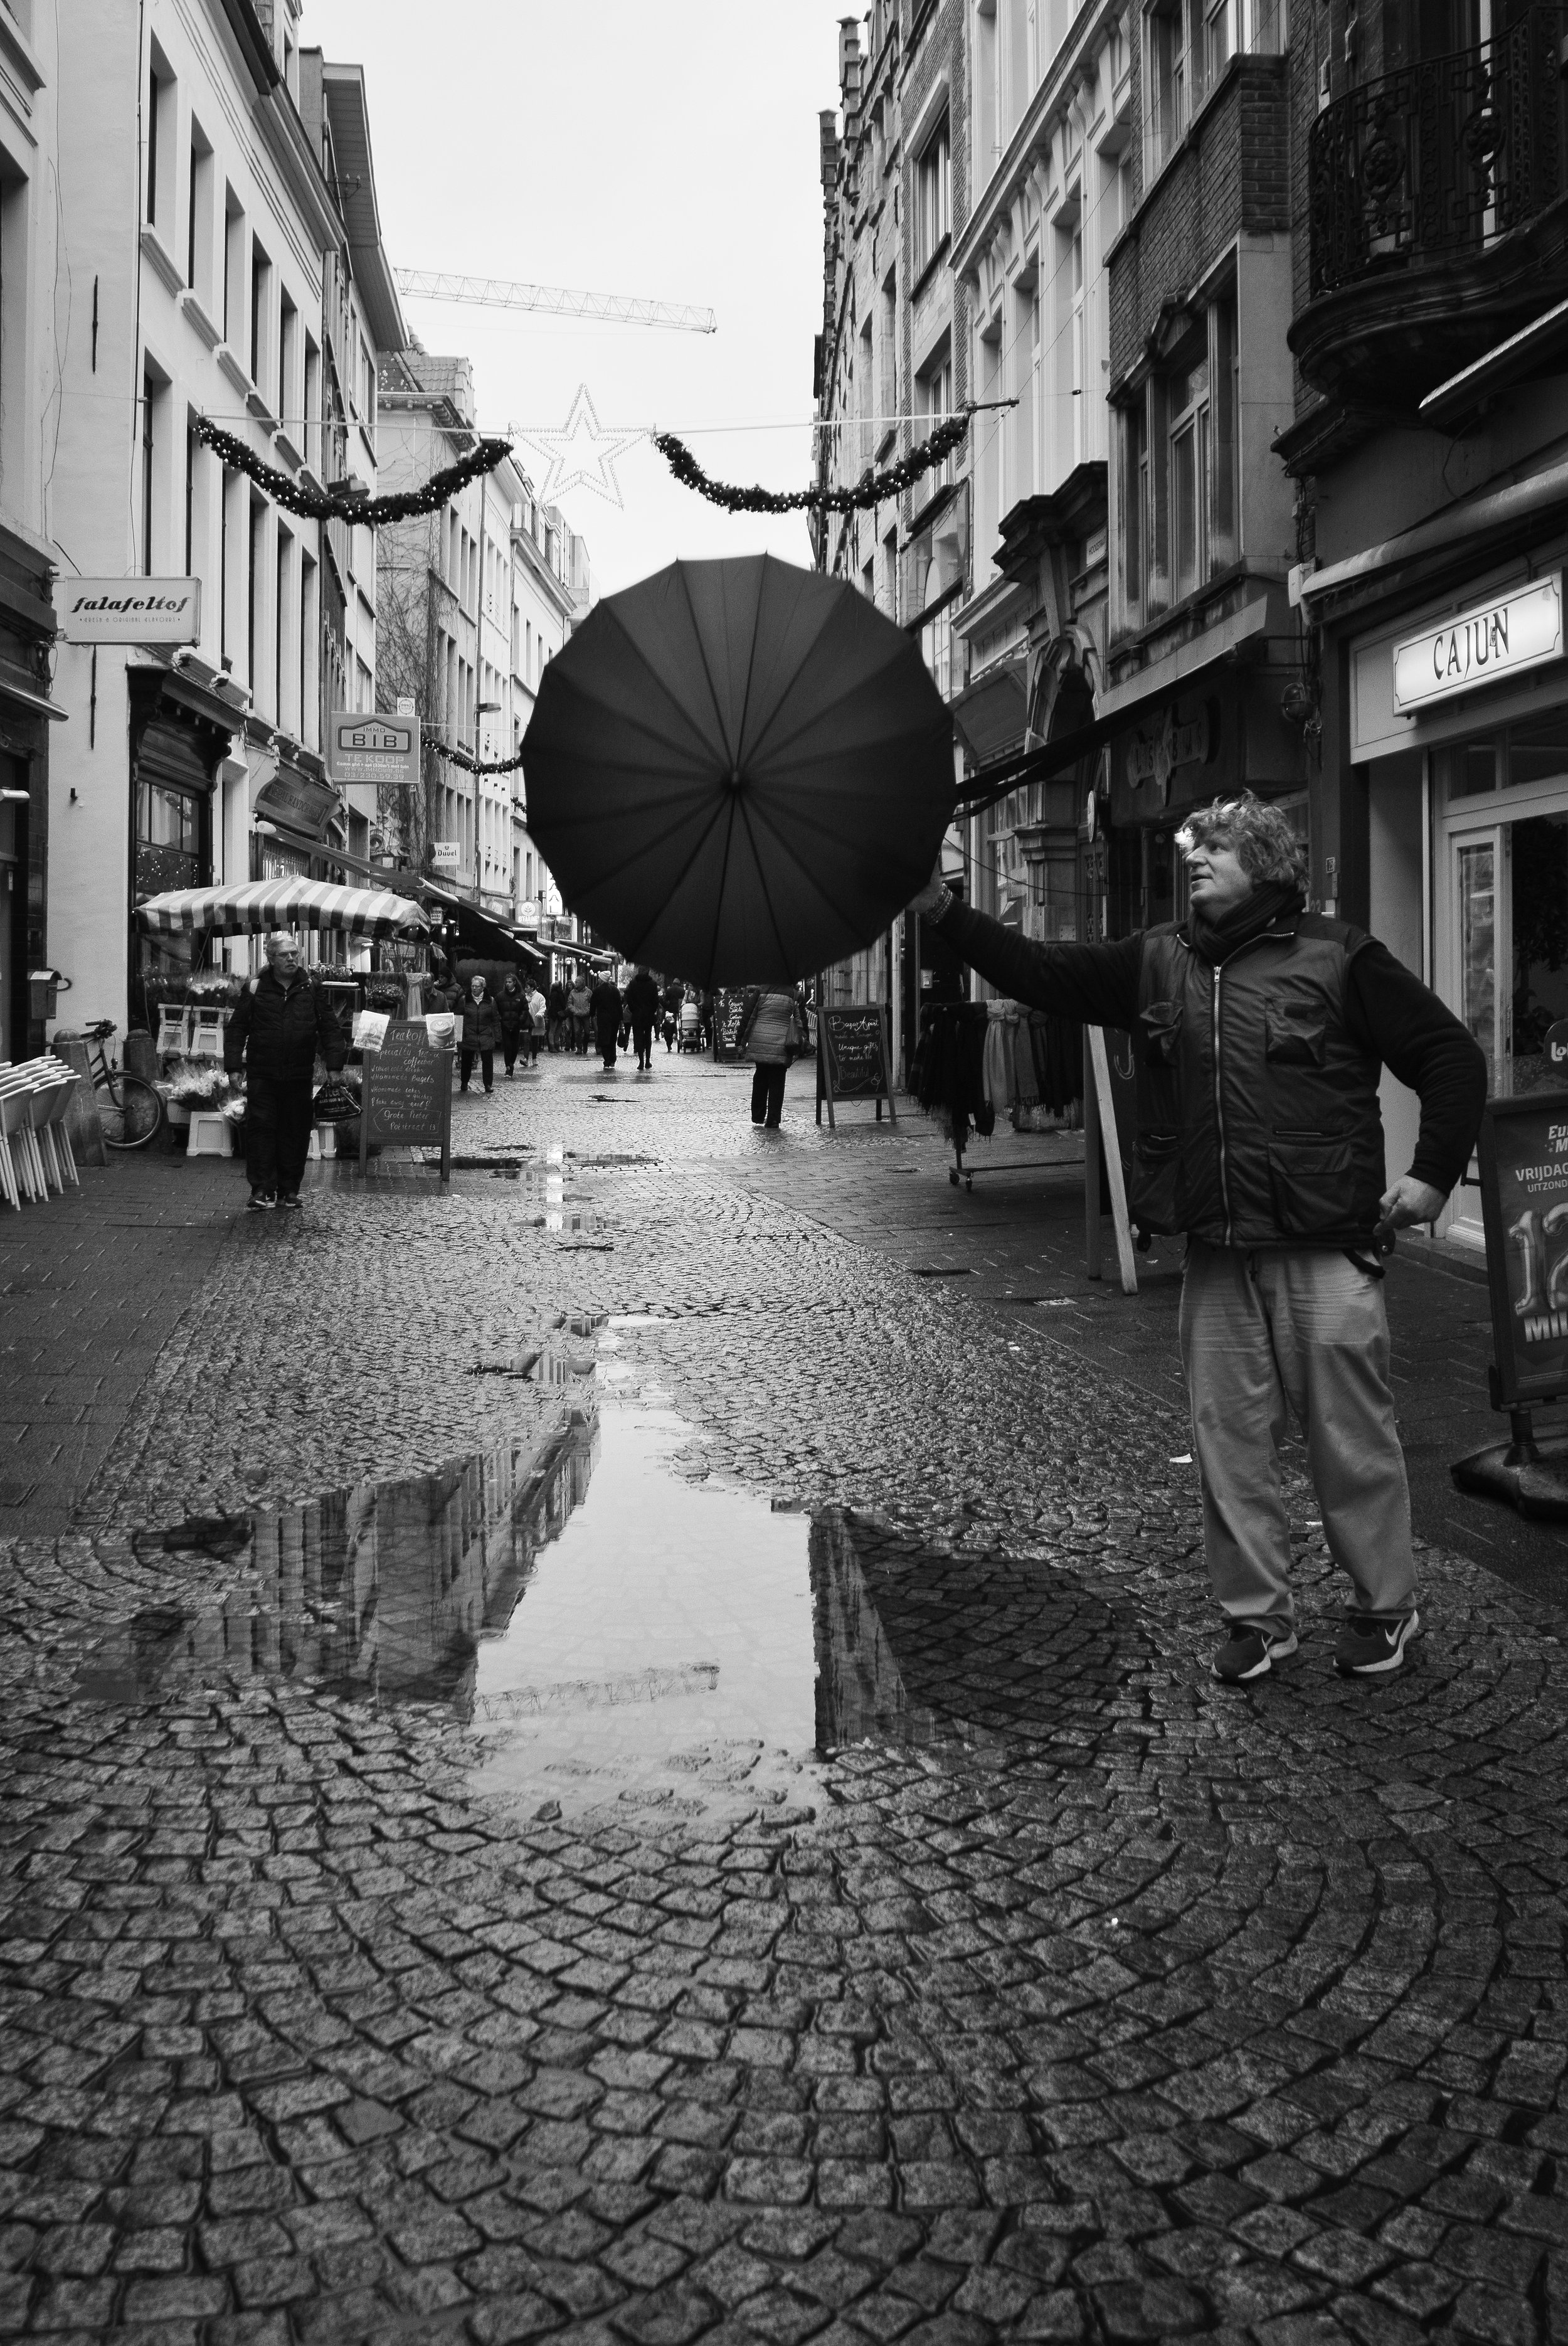 viewfinder_creativeboody_straatfotografie_antwerpen_paraplu^-2.jpg